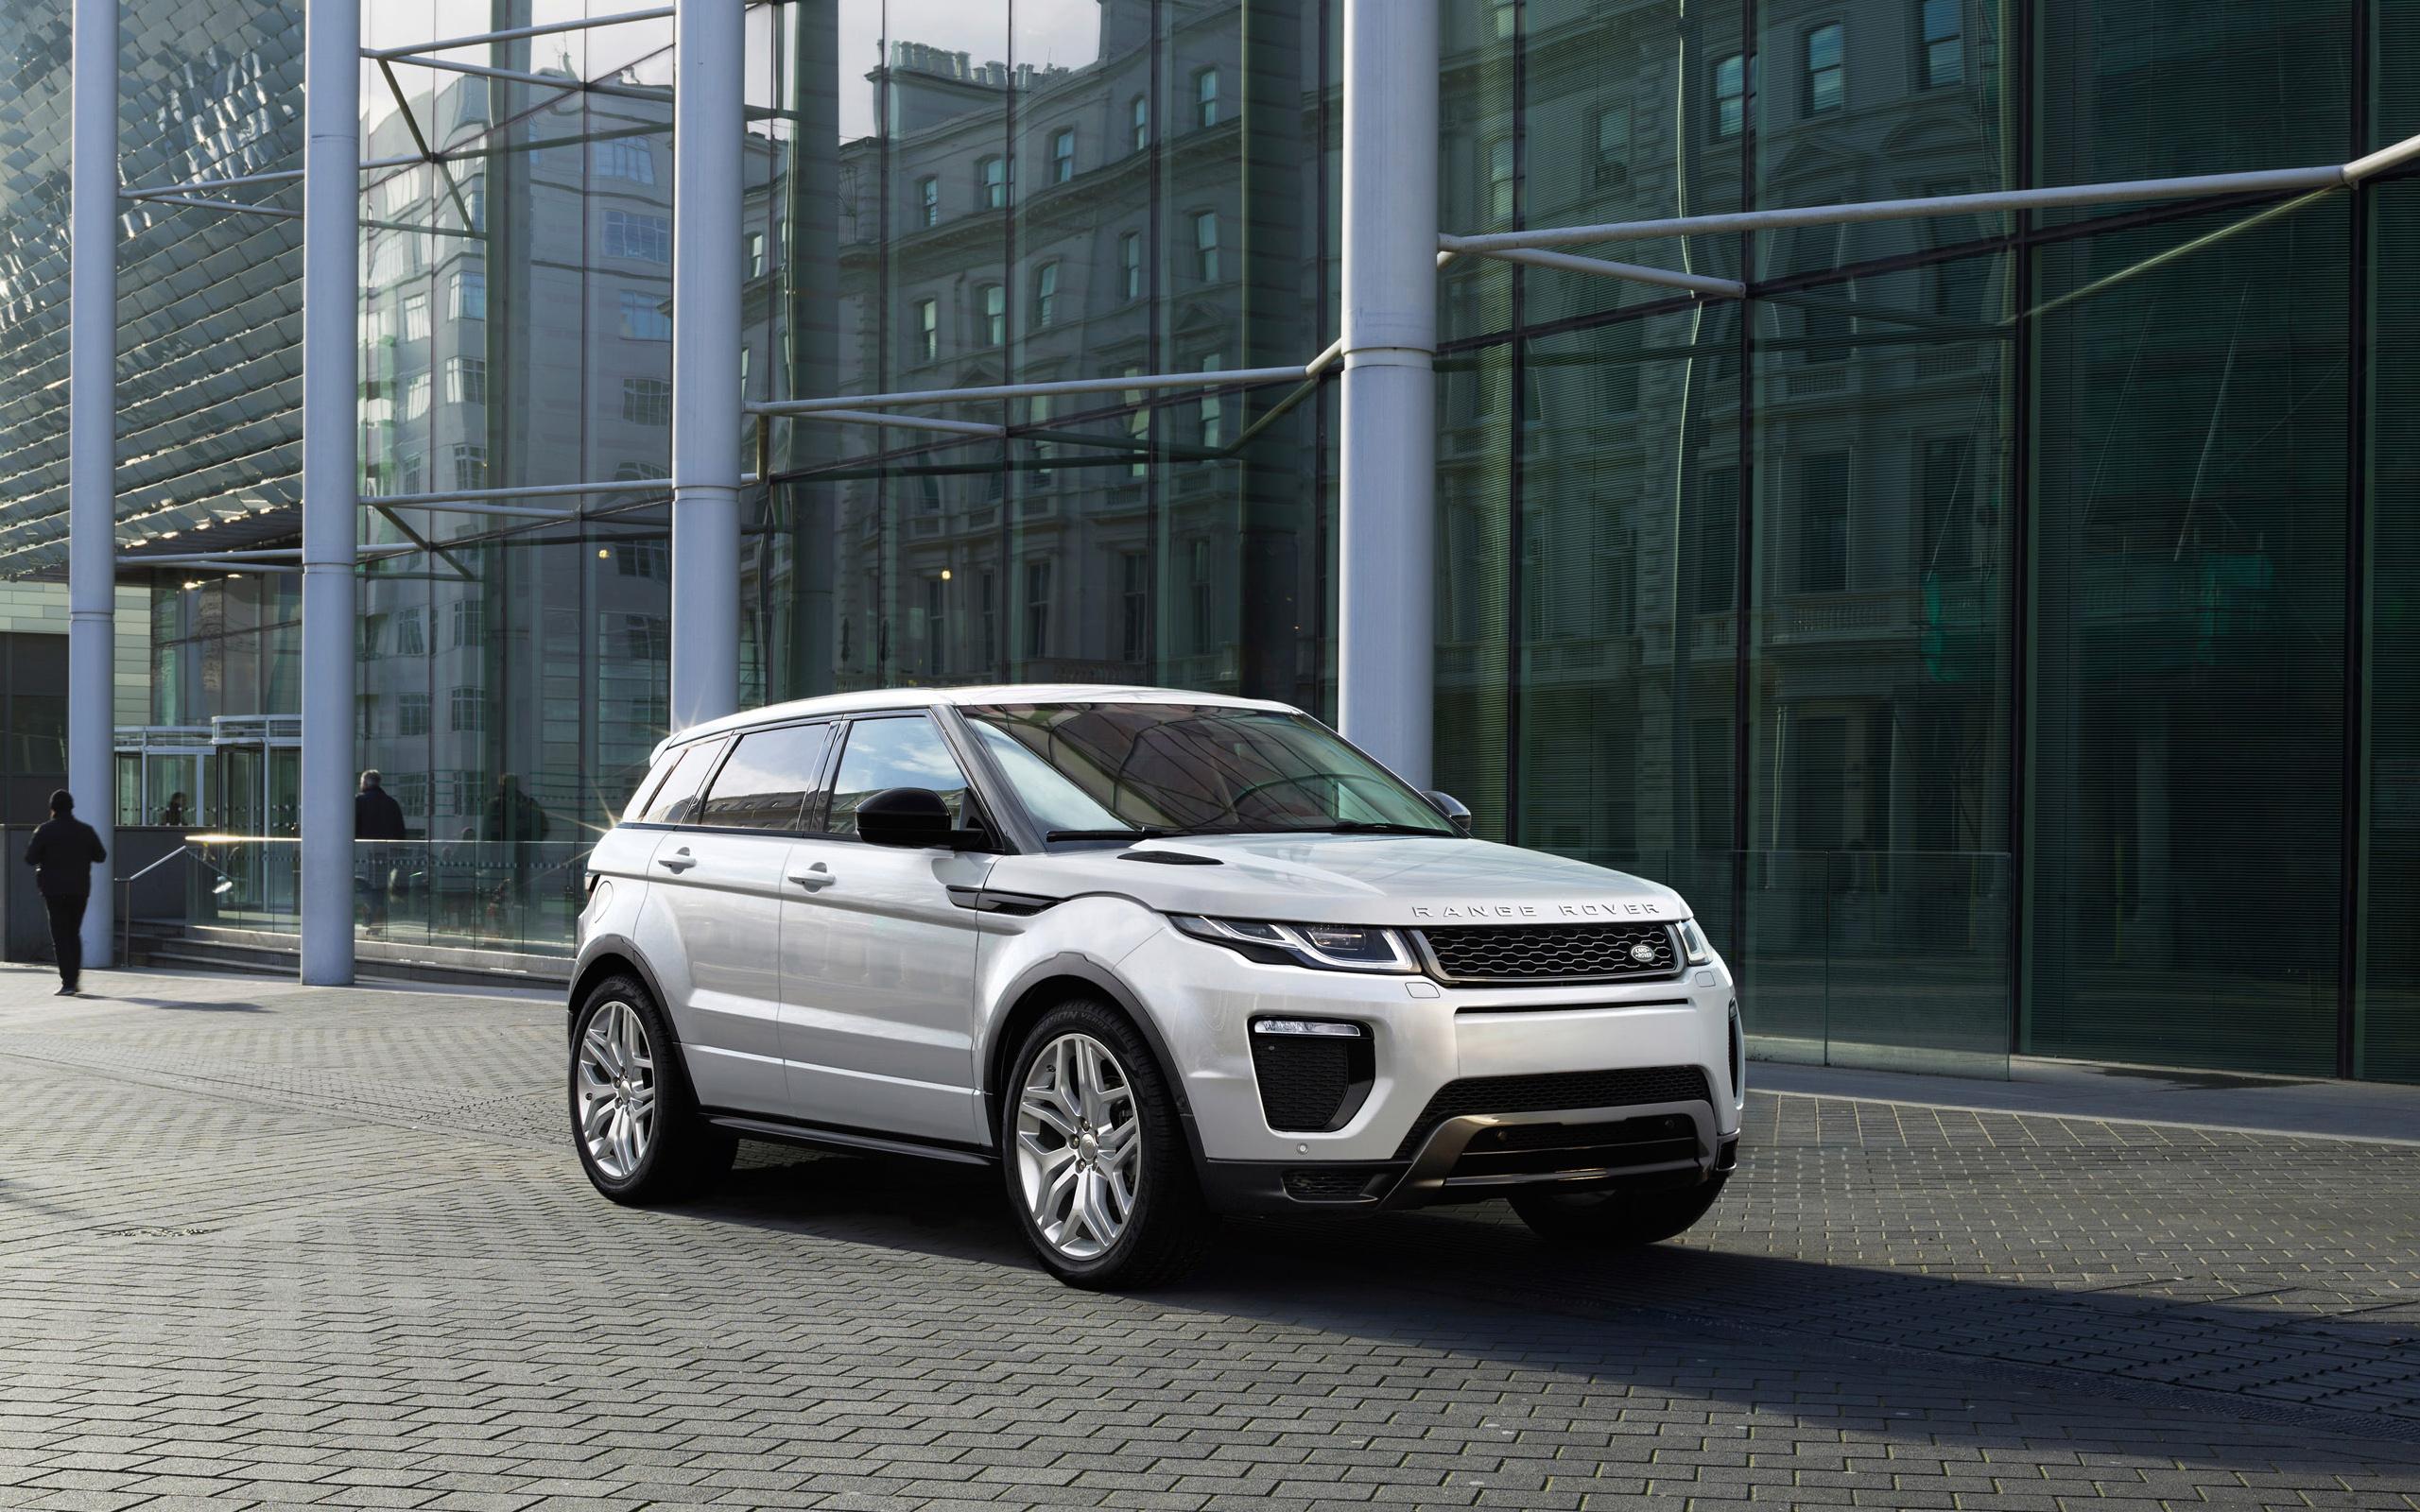 2016 Range Rover Evoque Car HD Wallpaper FullHDWpp   Full HD 2560x1600